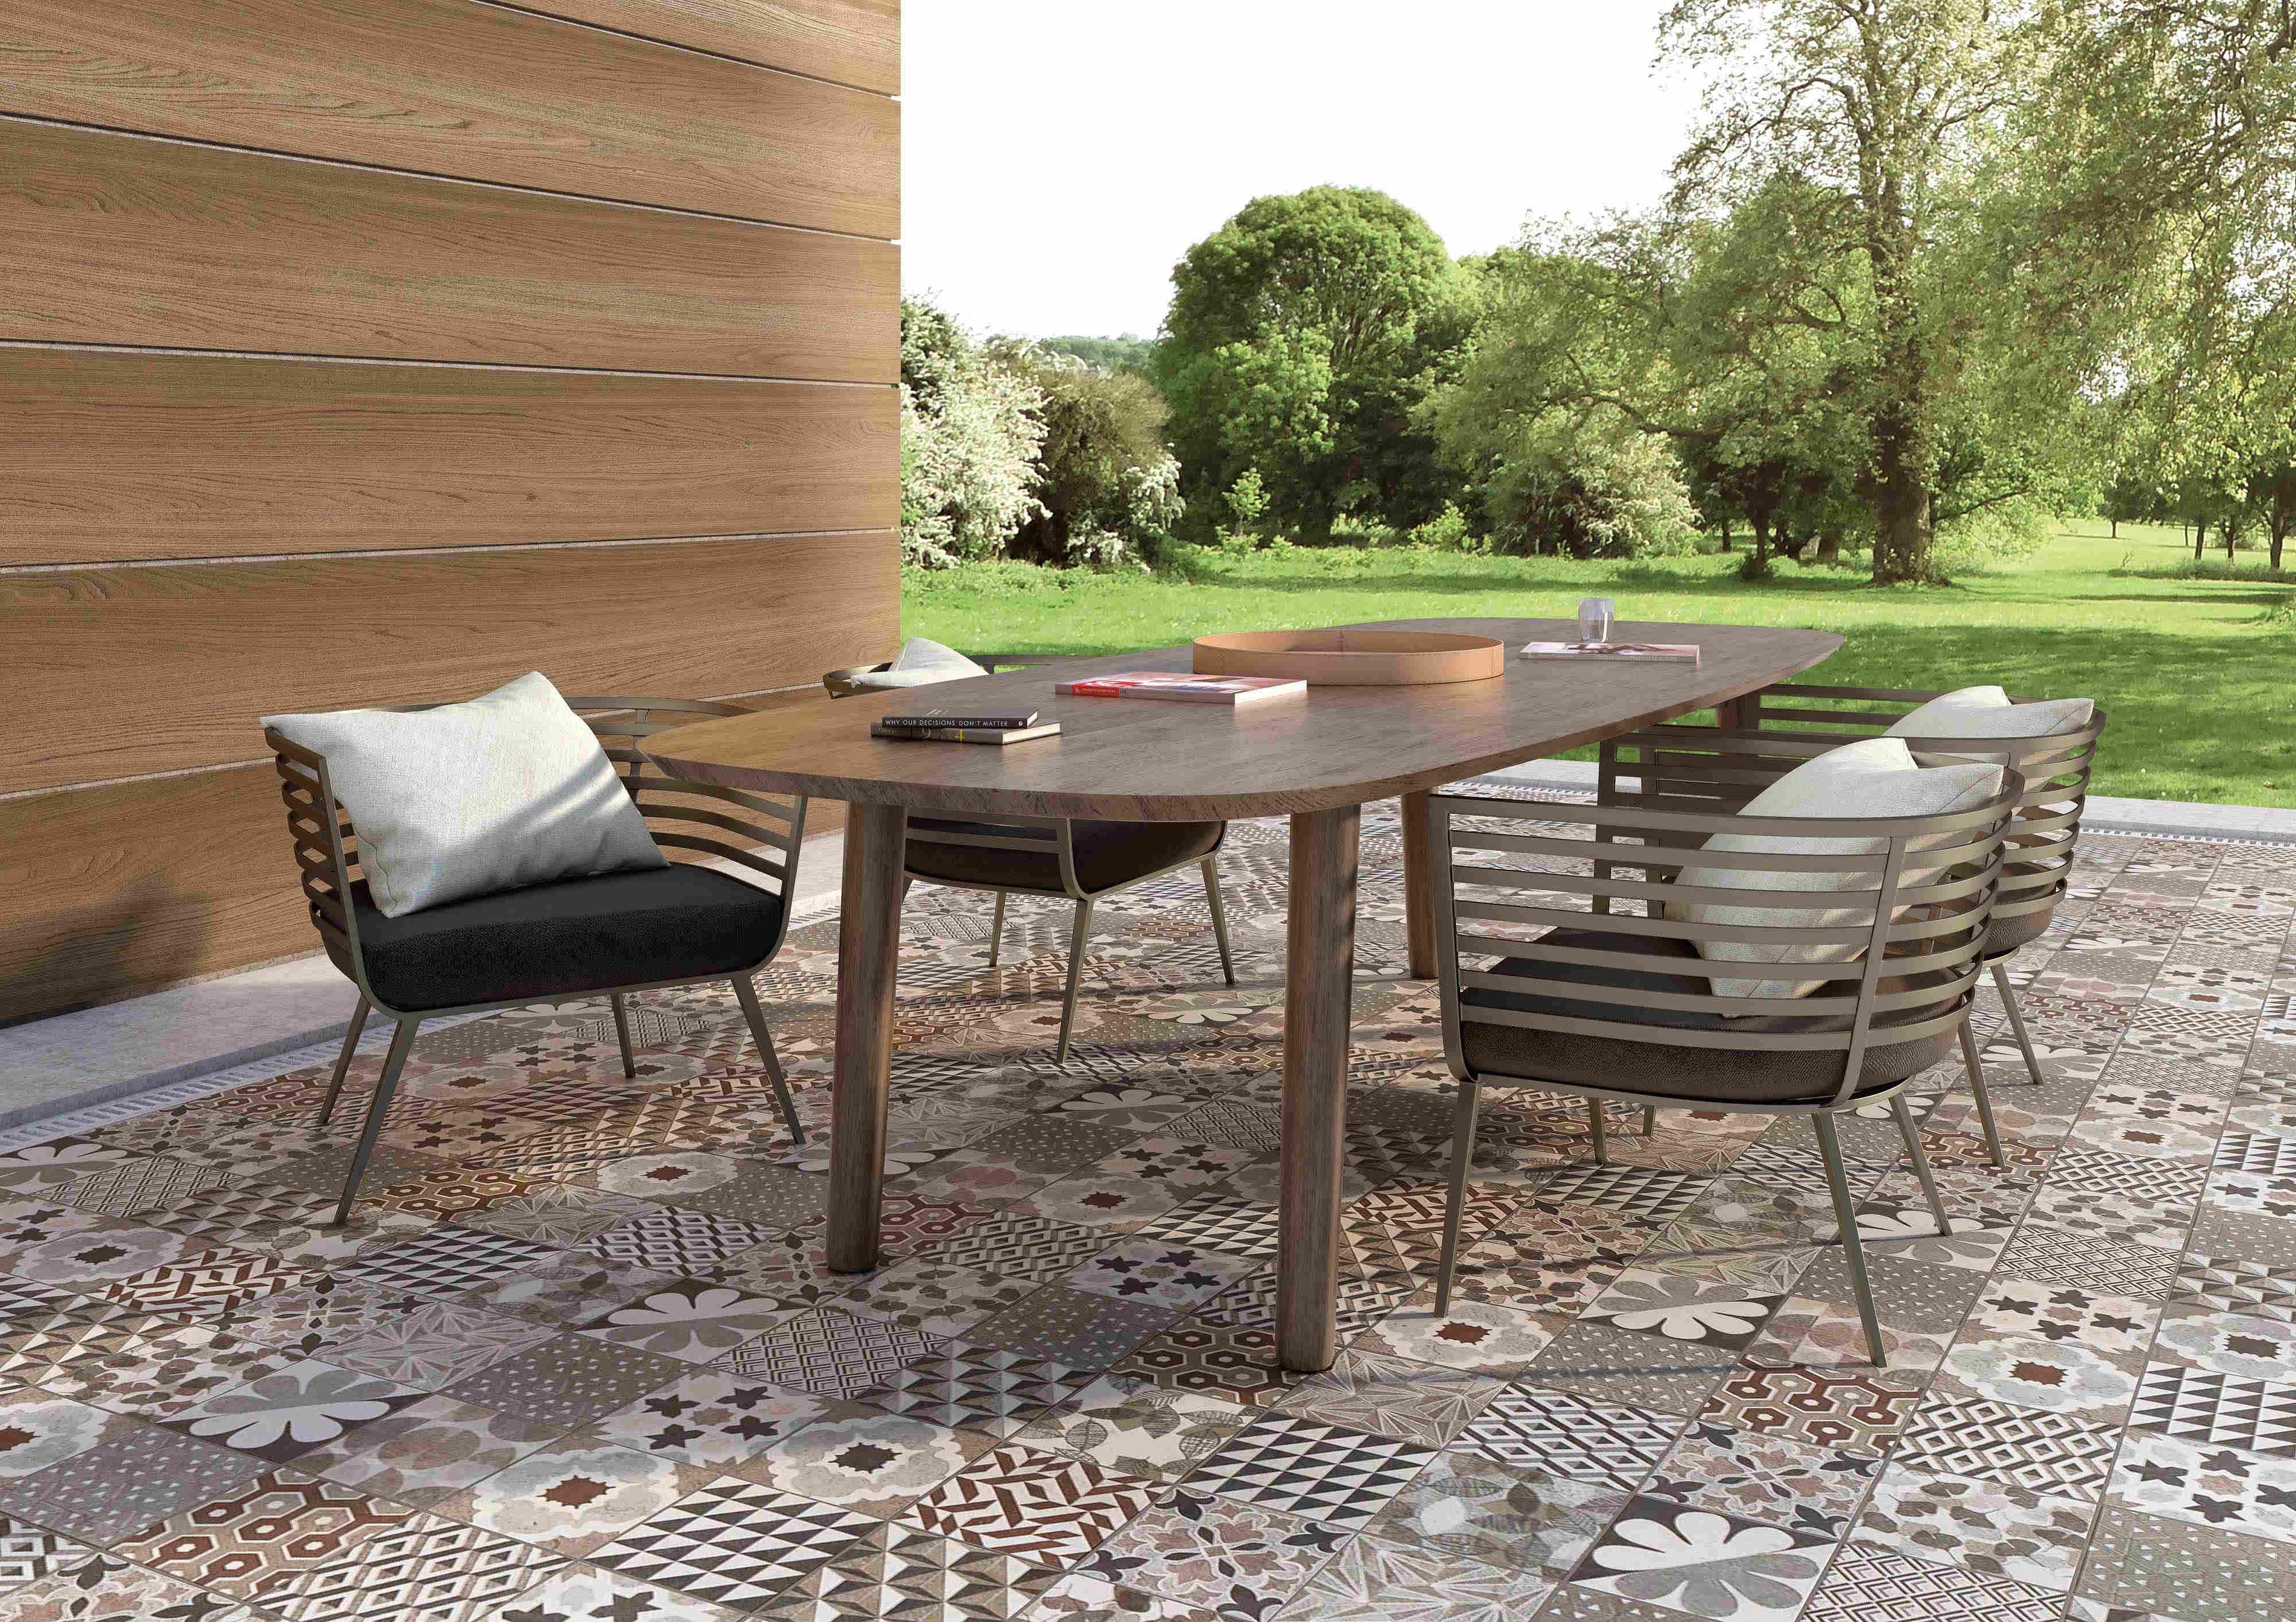 neocim-plus-terrasse-dlazba-venkovni-20x20-dekory-patchwork-02